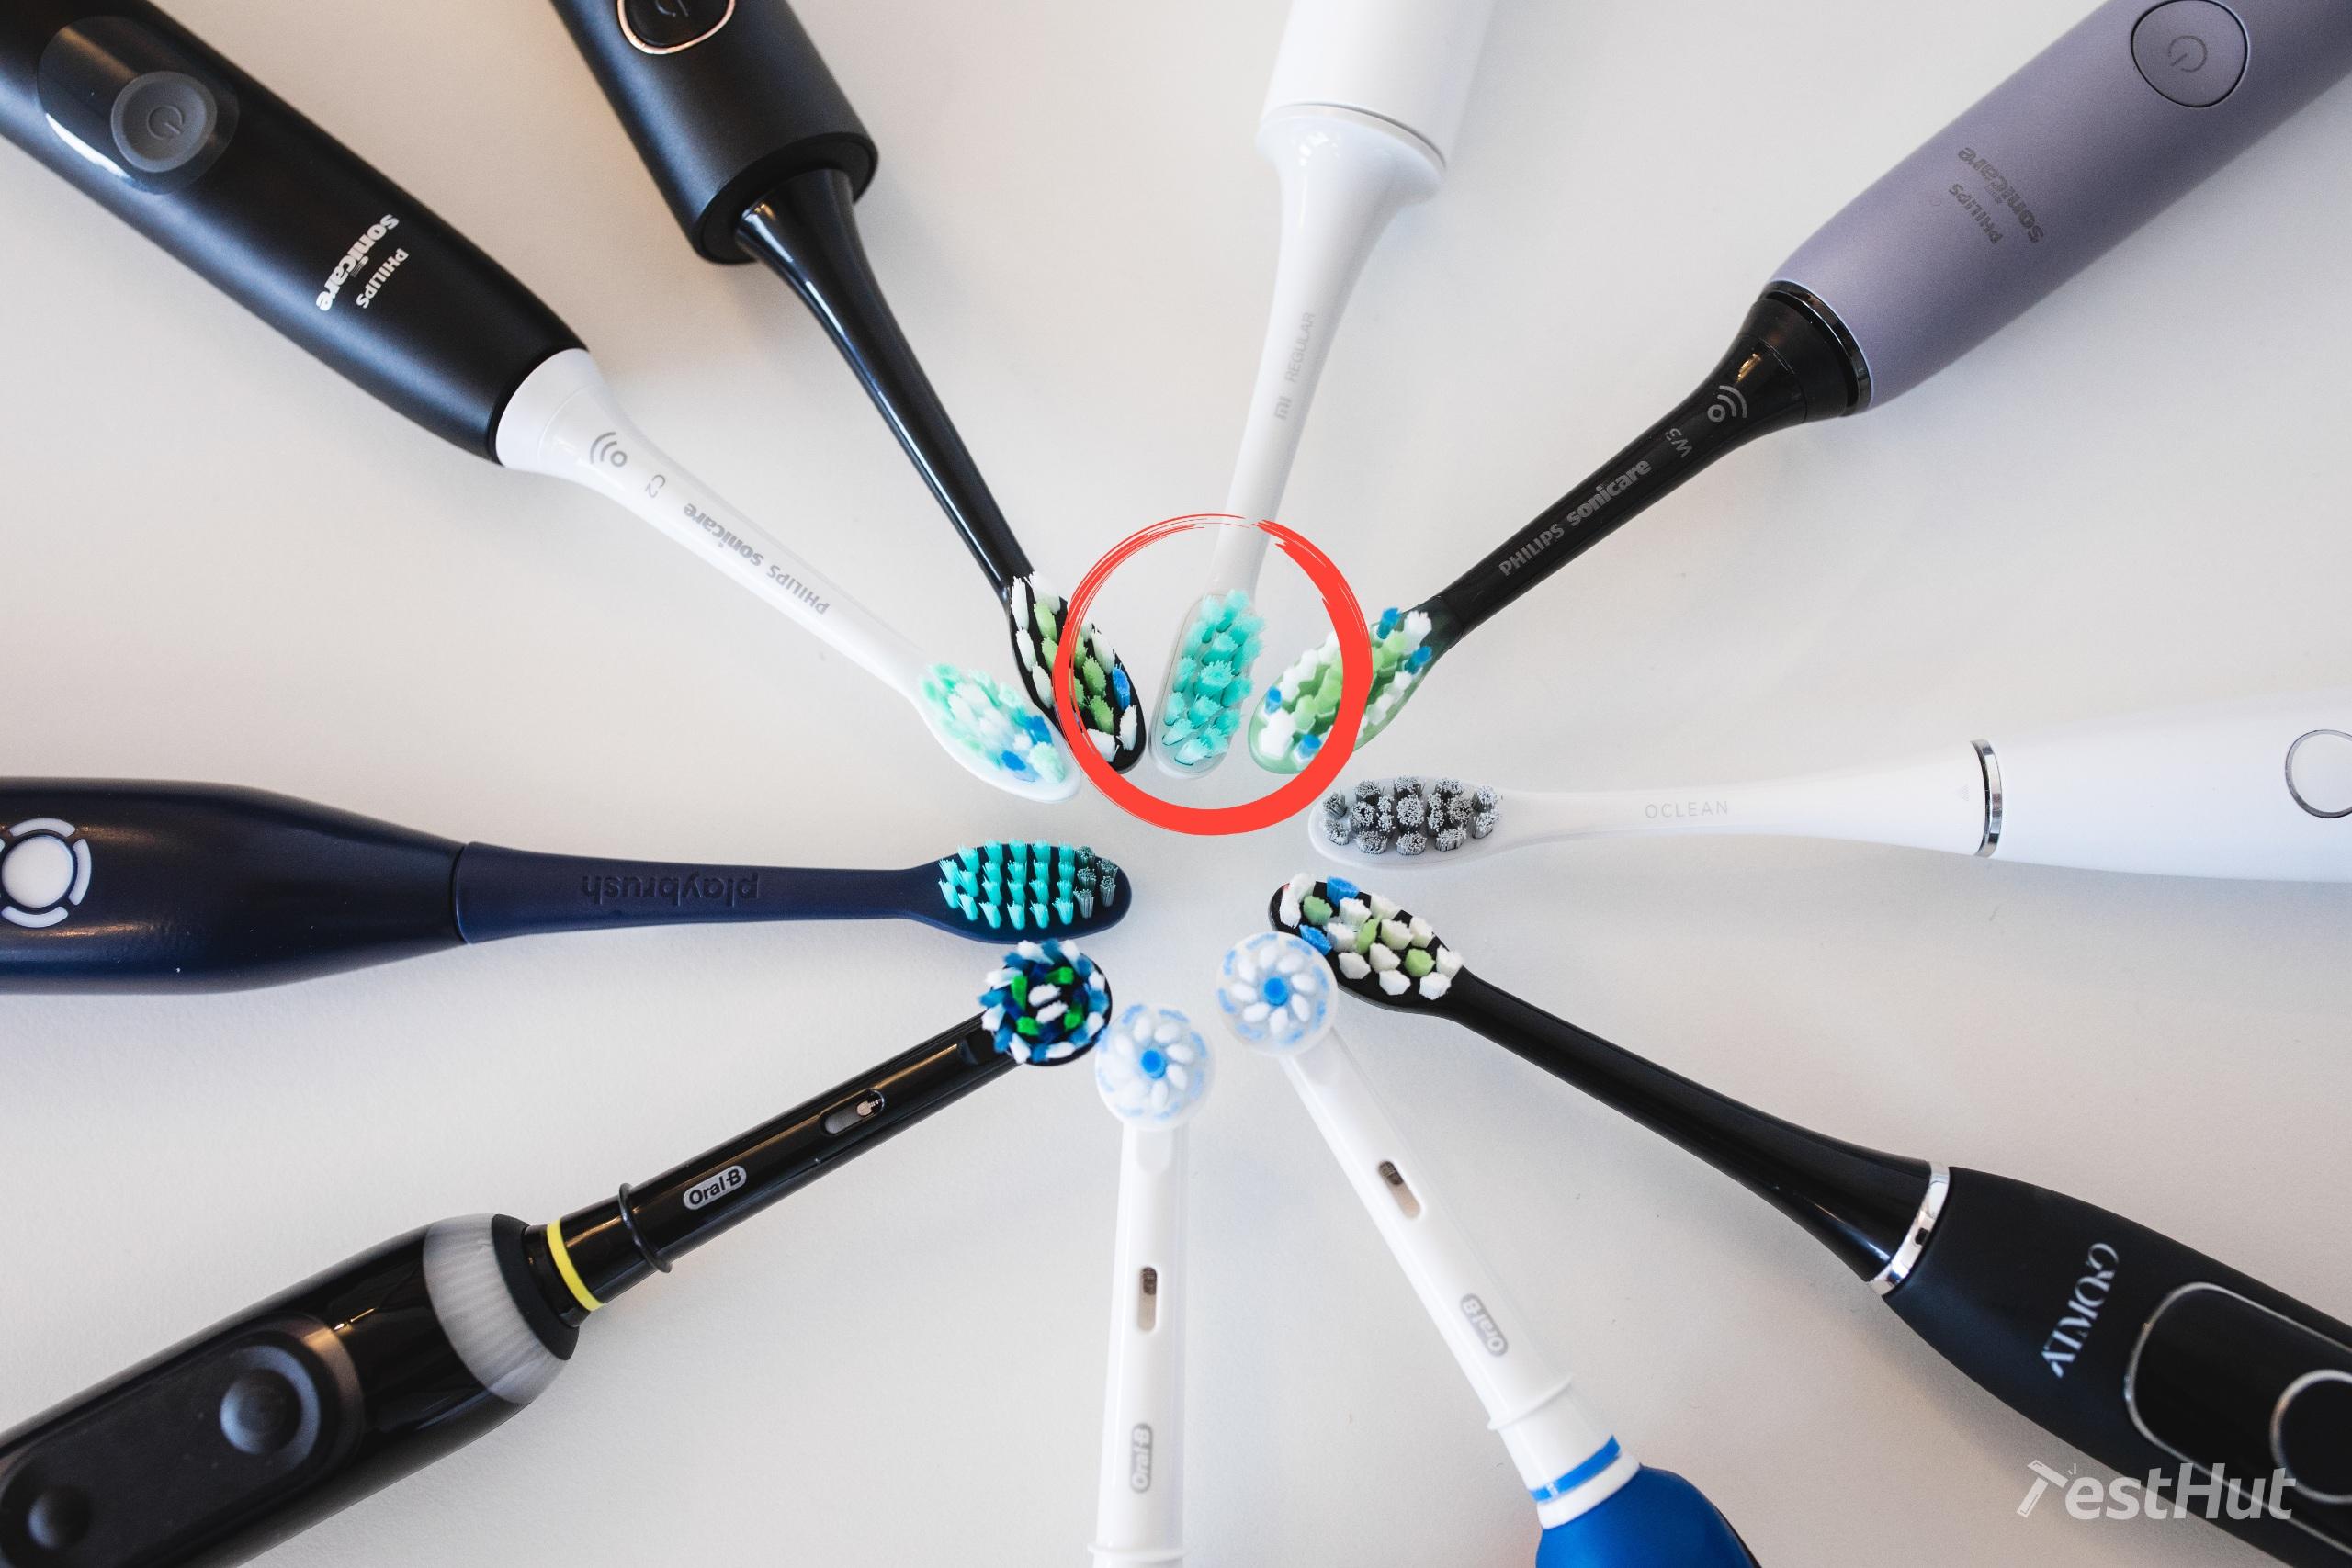 Xiaomi Mi Electric Toothbrush heads comparison